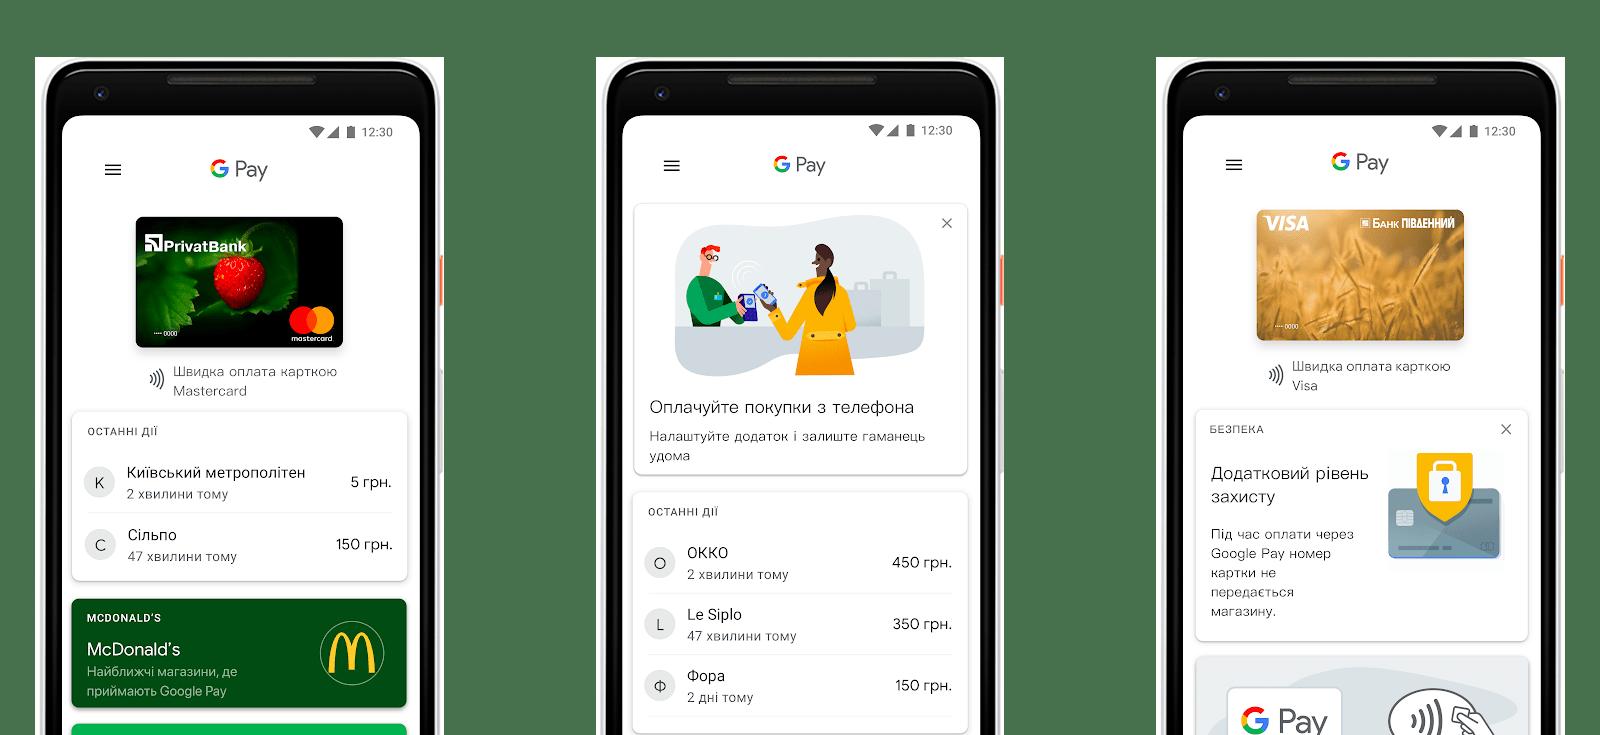 Google переименовала сервис Android Pay в Google Pay (G Pay